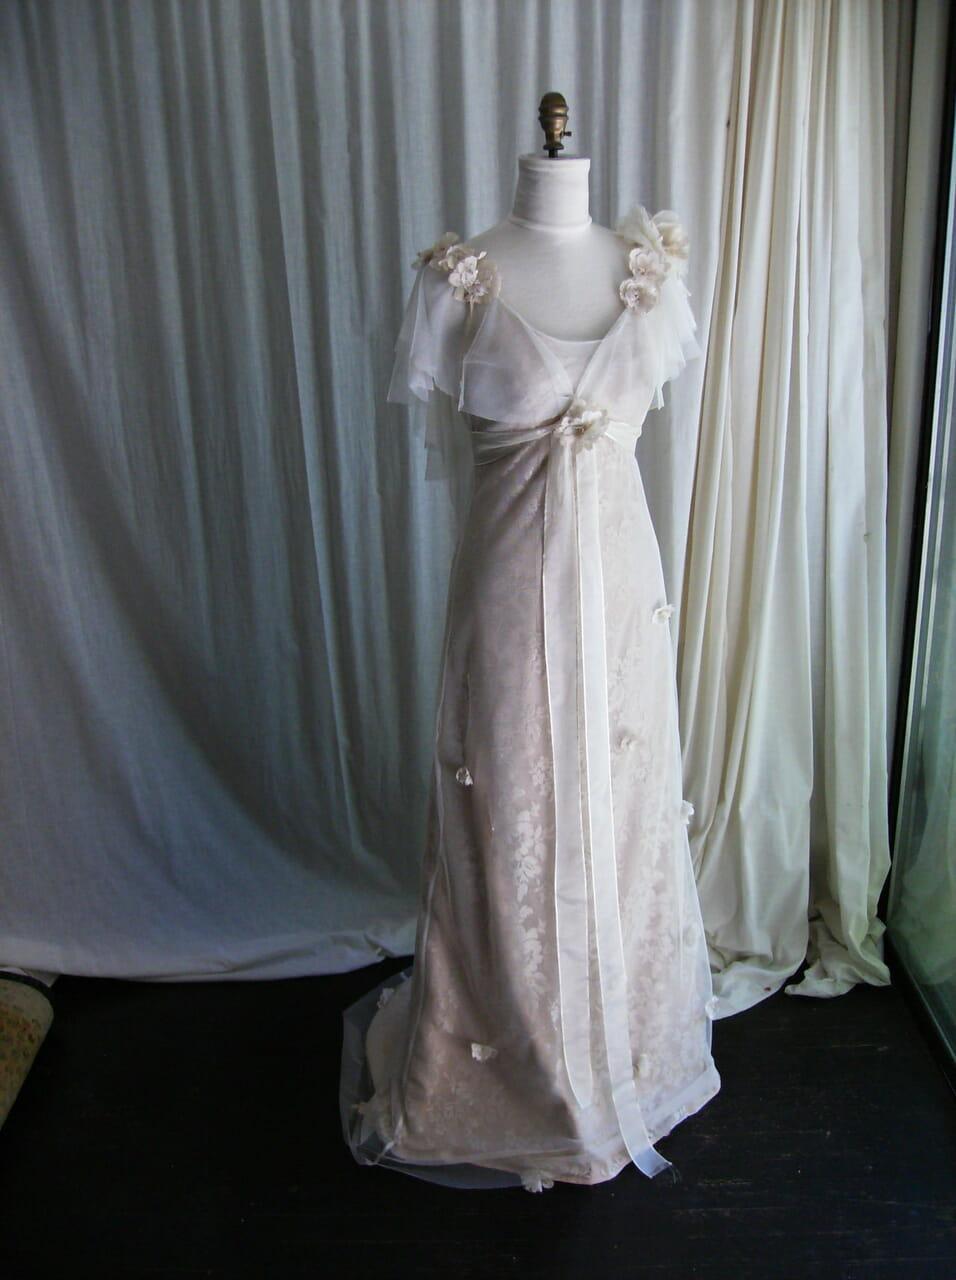 vintage wedding dress, wedding dresses, and amy jo tatum image